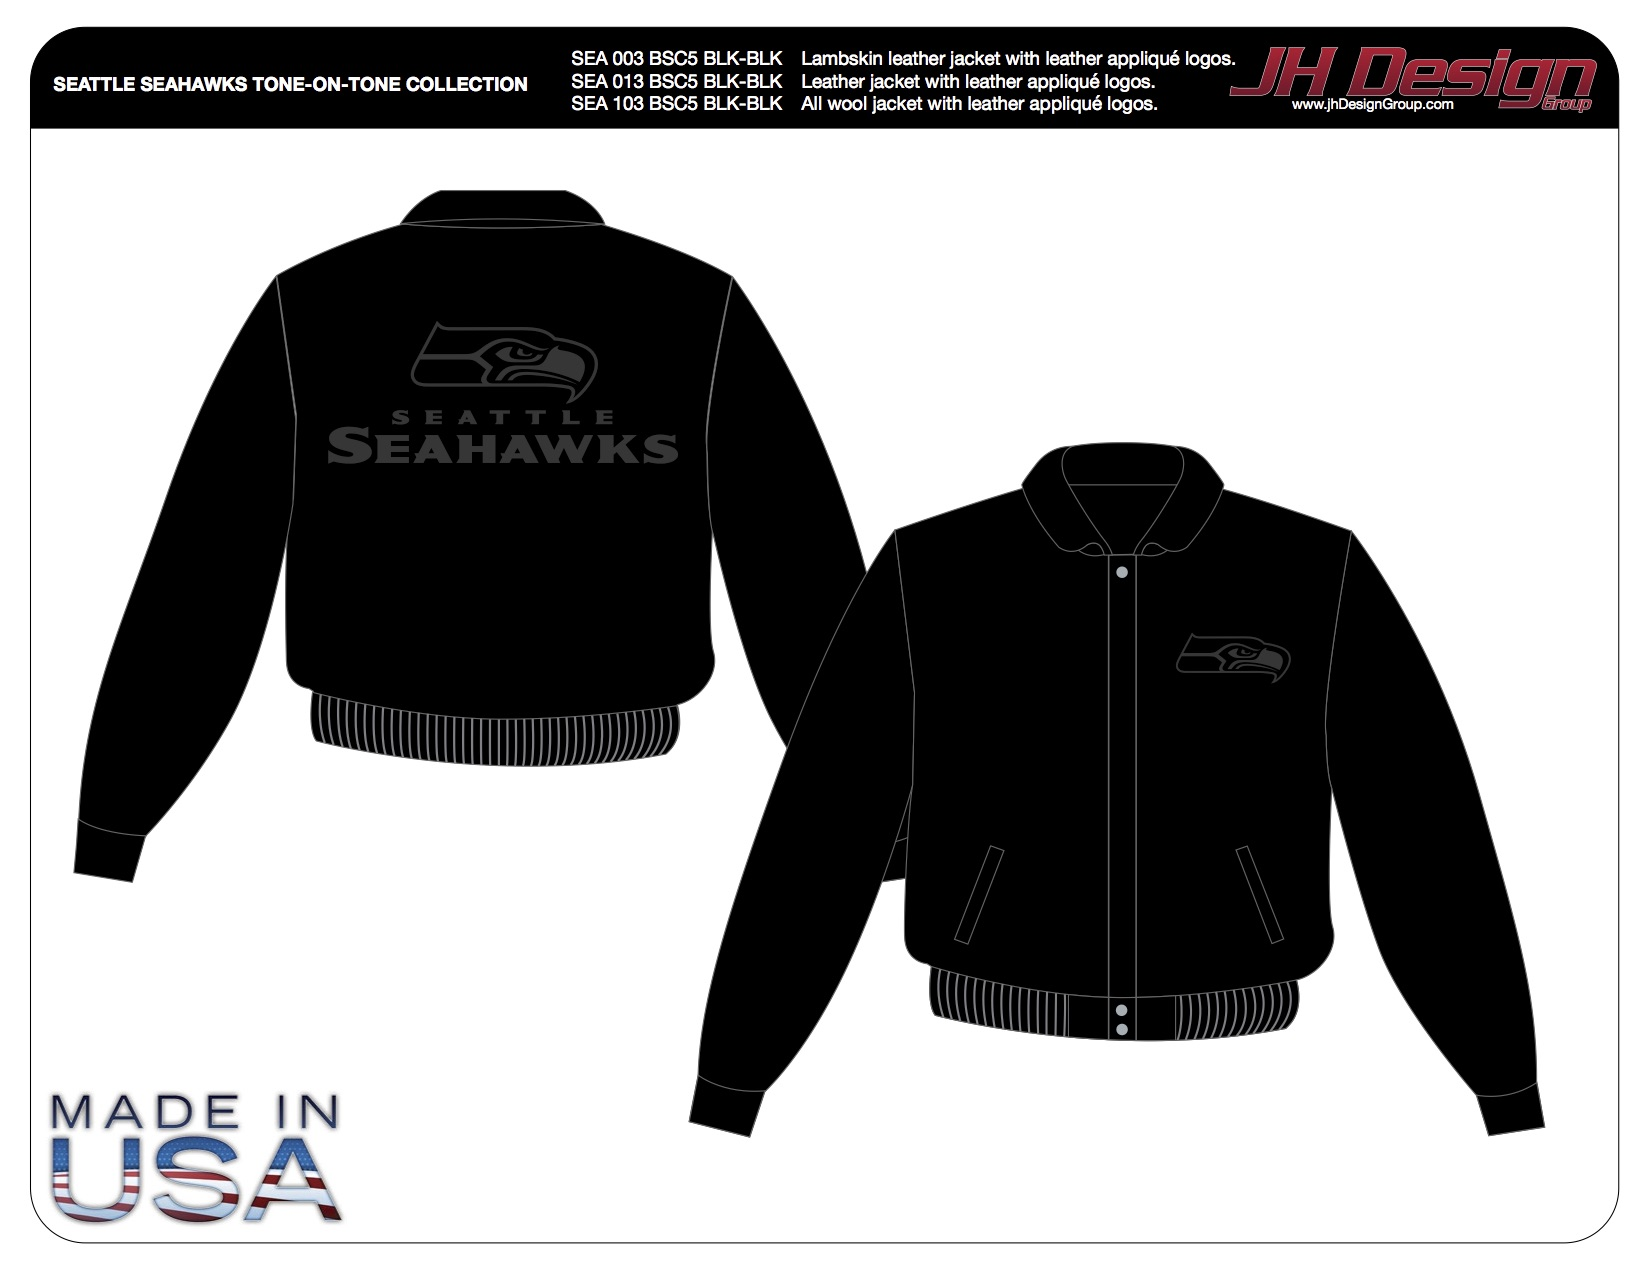 SEA 013 BSC5 BLK-BLK